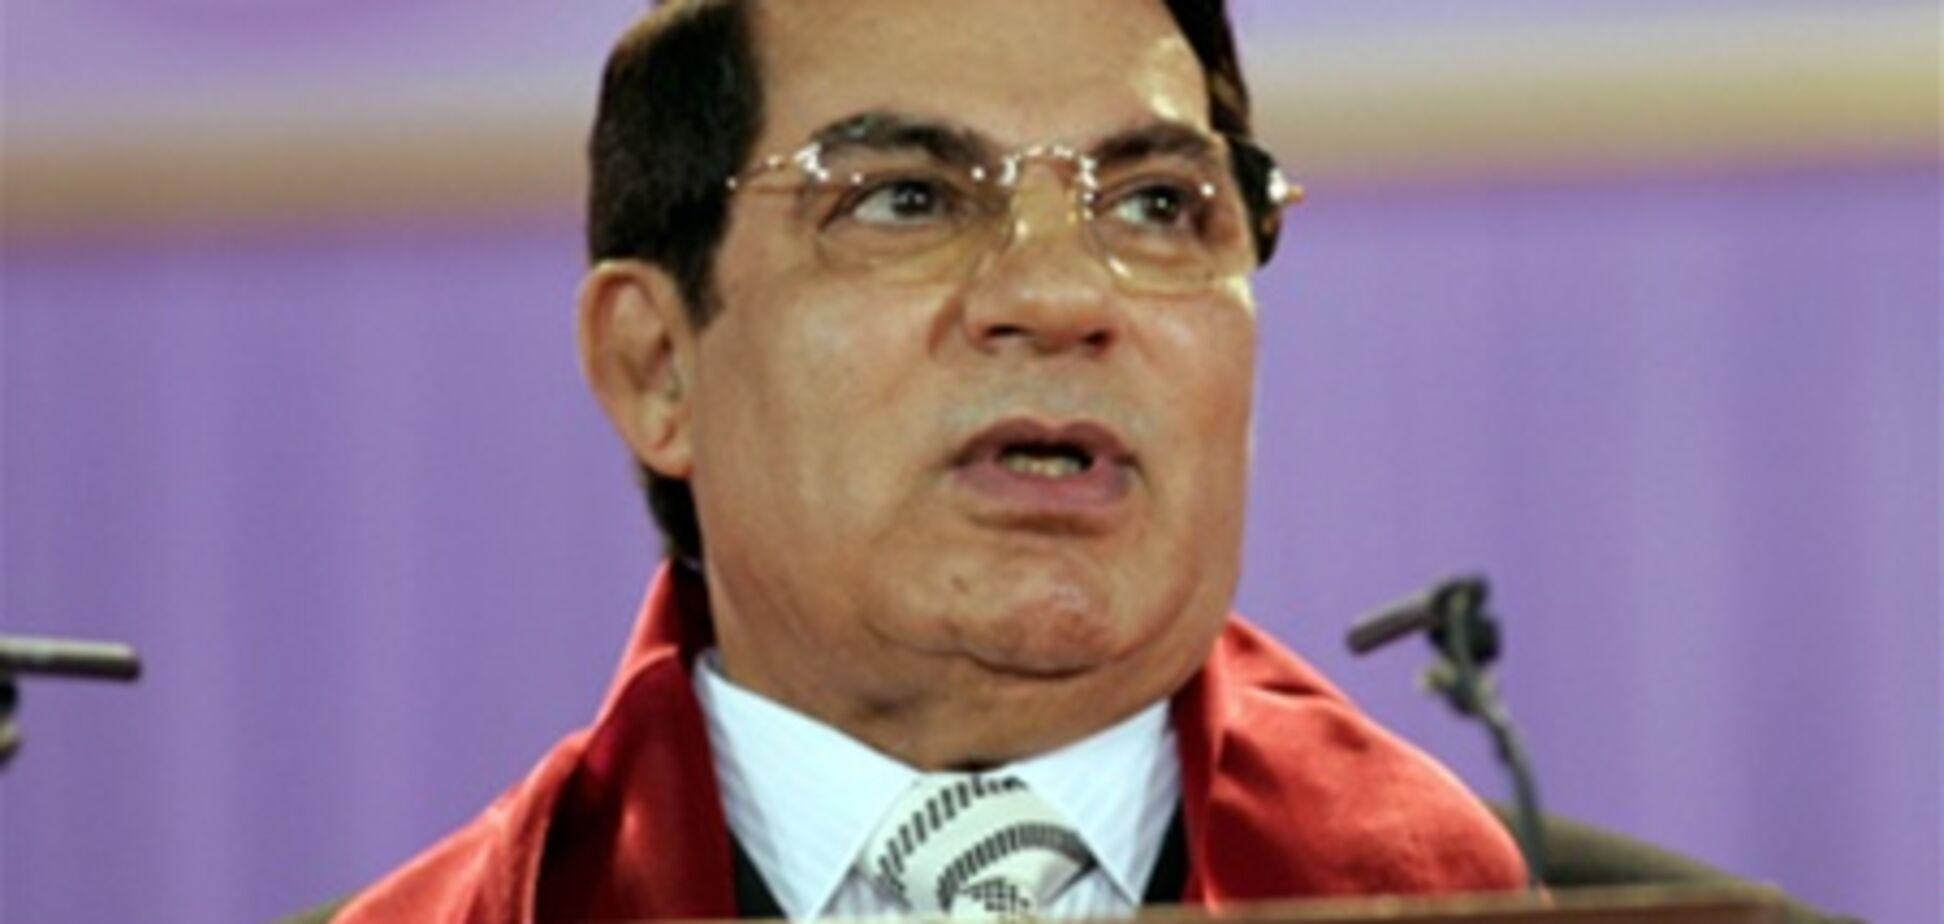 Экс-президента Туниса приговорили к 20 годам